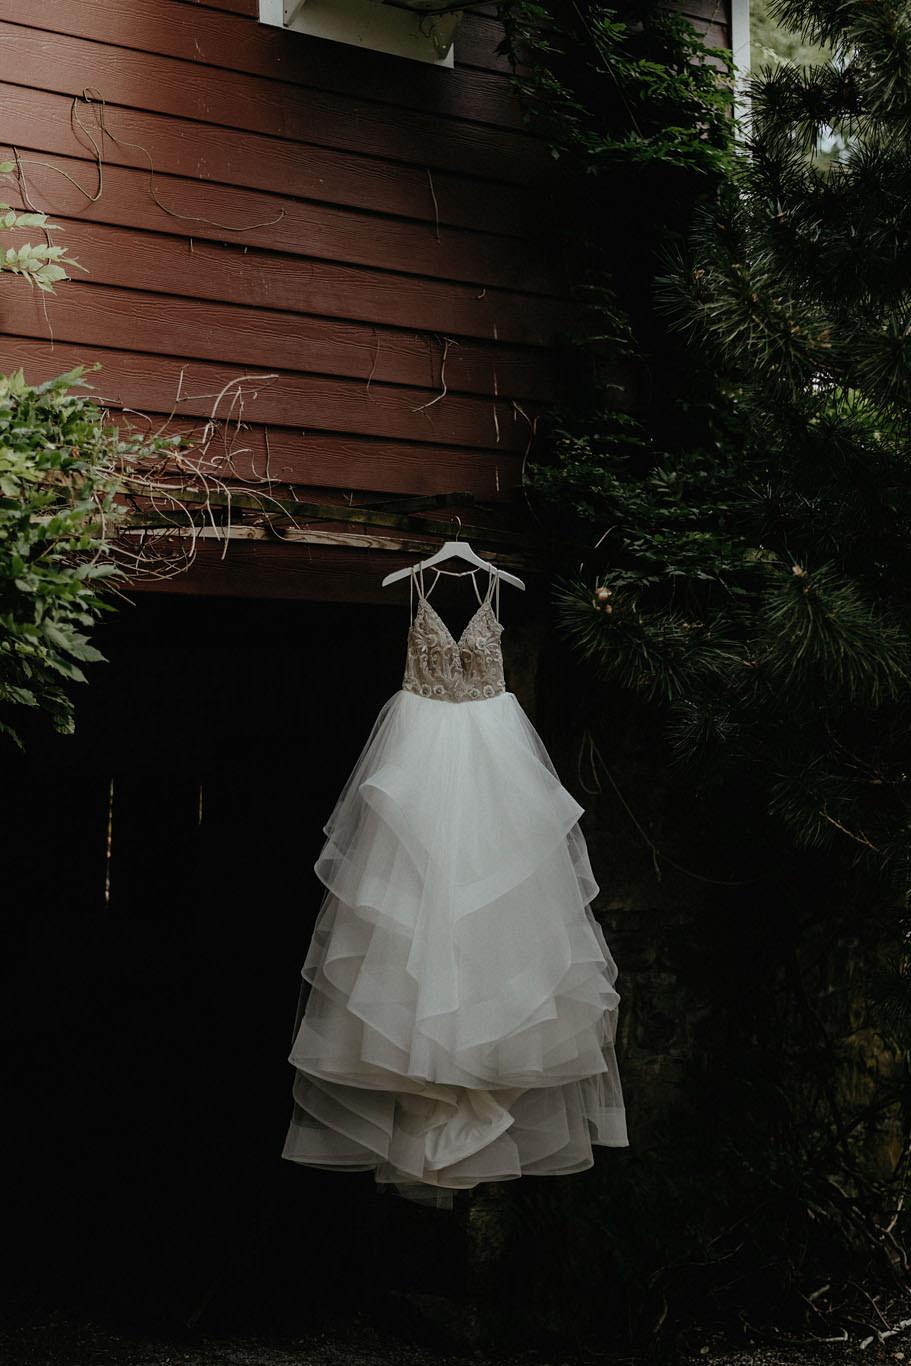 andover new jersey crossed keys estate adventure wedding photographer dress